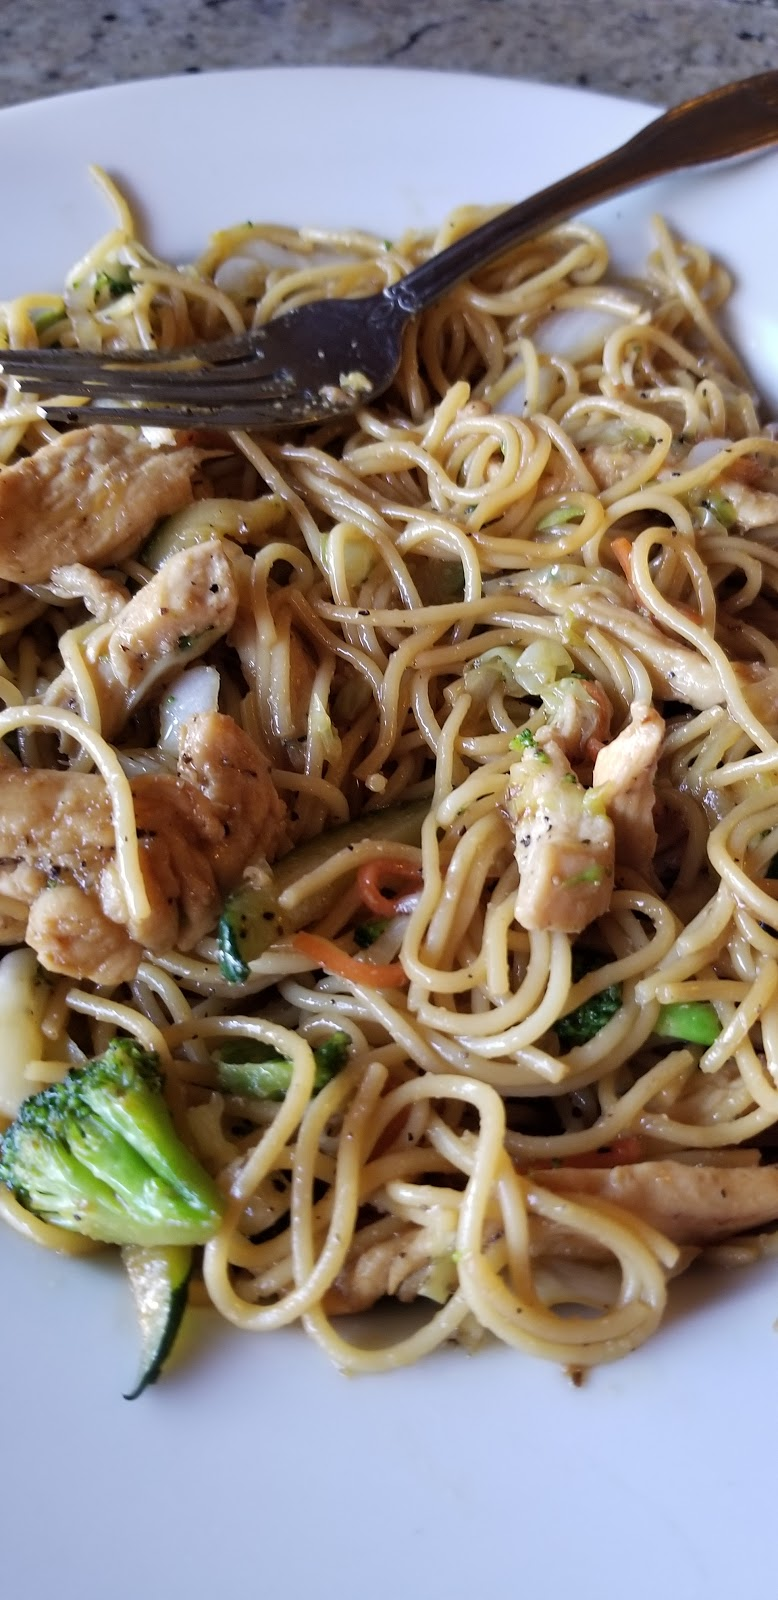 Zen Seafood & Sushi Grill - restaurant    Photo 5 of 10   Address: 5517 McPherson Rd #8, Laredo, TX 78041, USA   Phone: (956) 568-7767